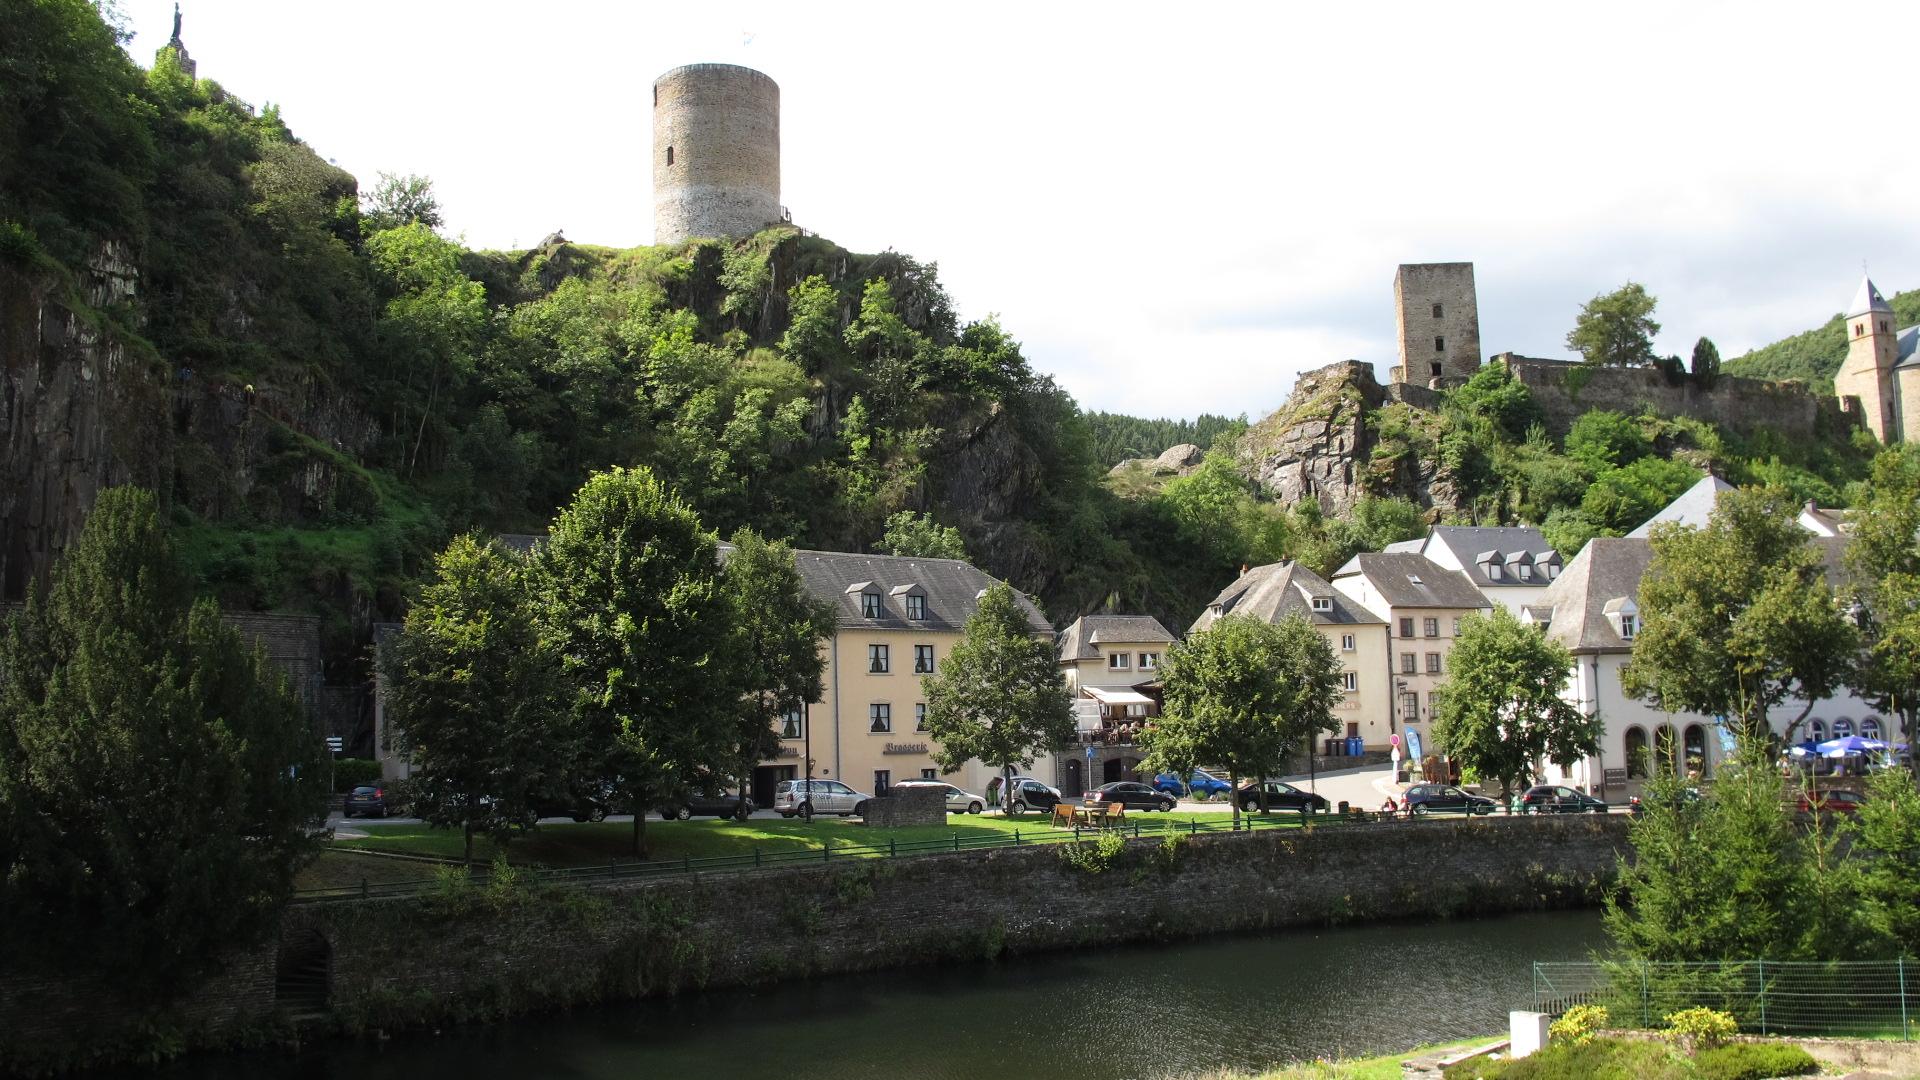 luxemburg-august-2014-039.jpg